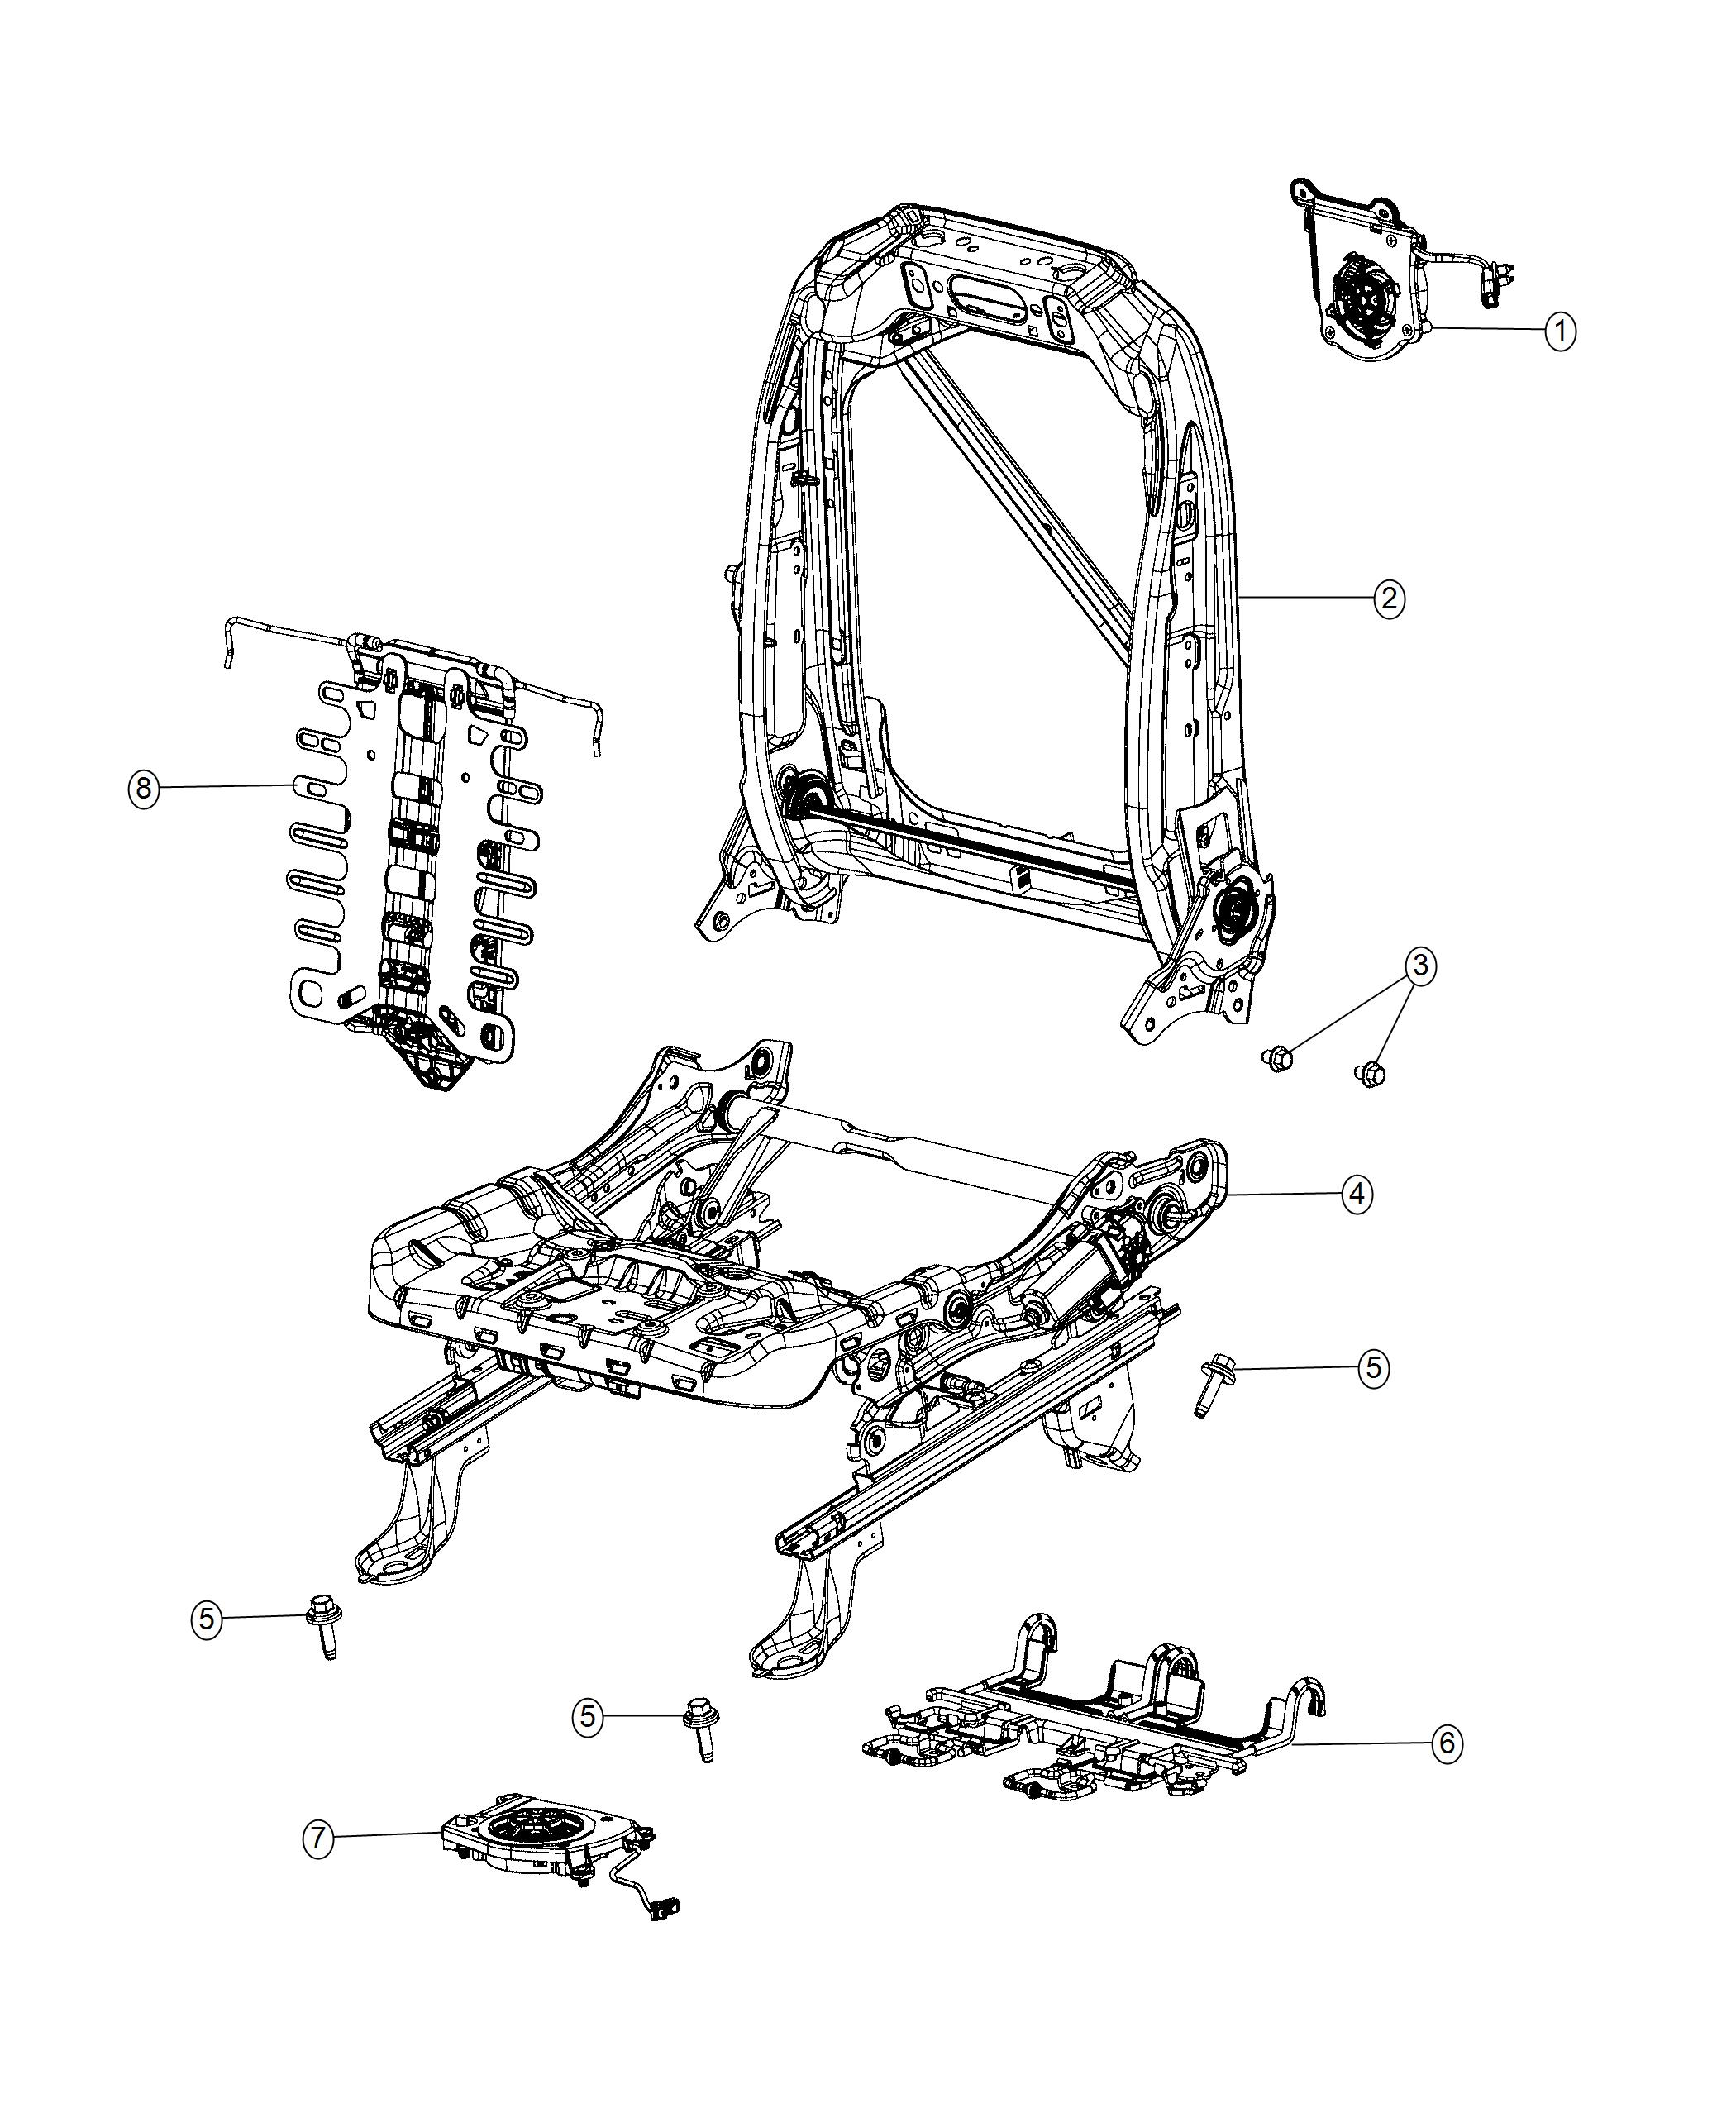 2017 Chrysler PACIFICA L HYBRID Adjuster. Power seat